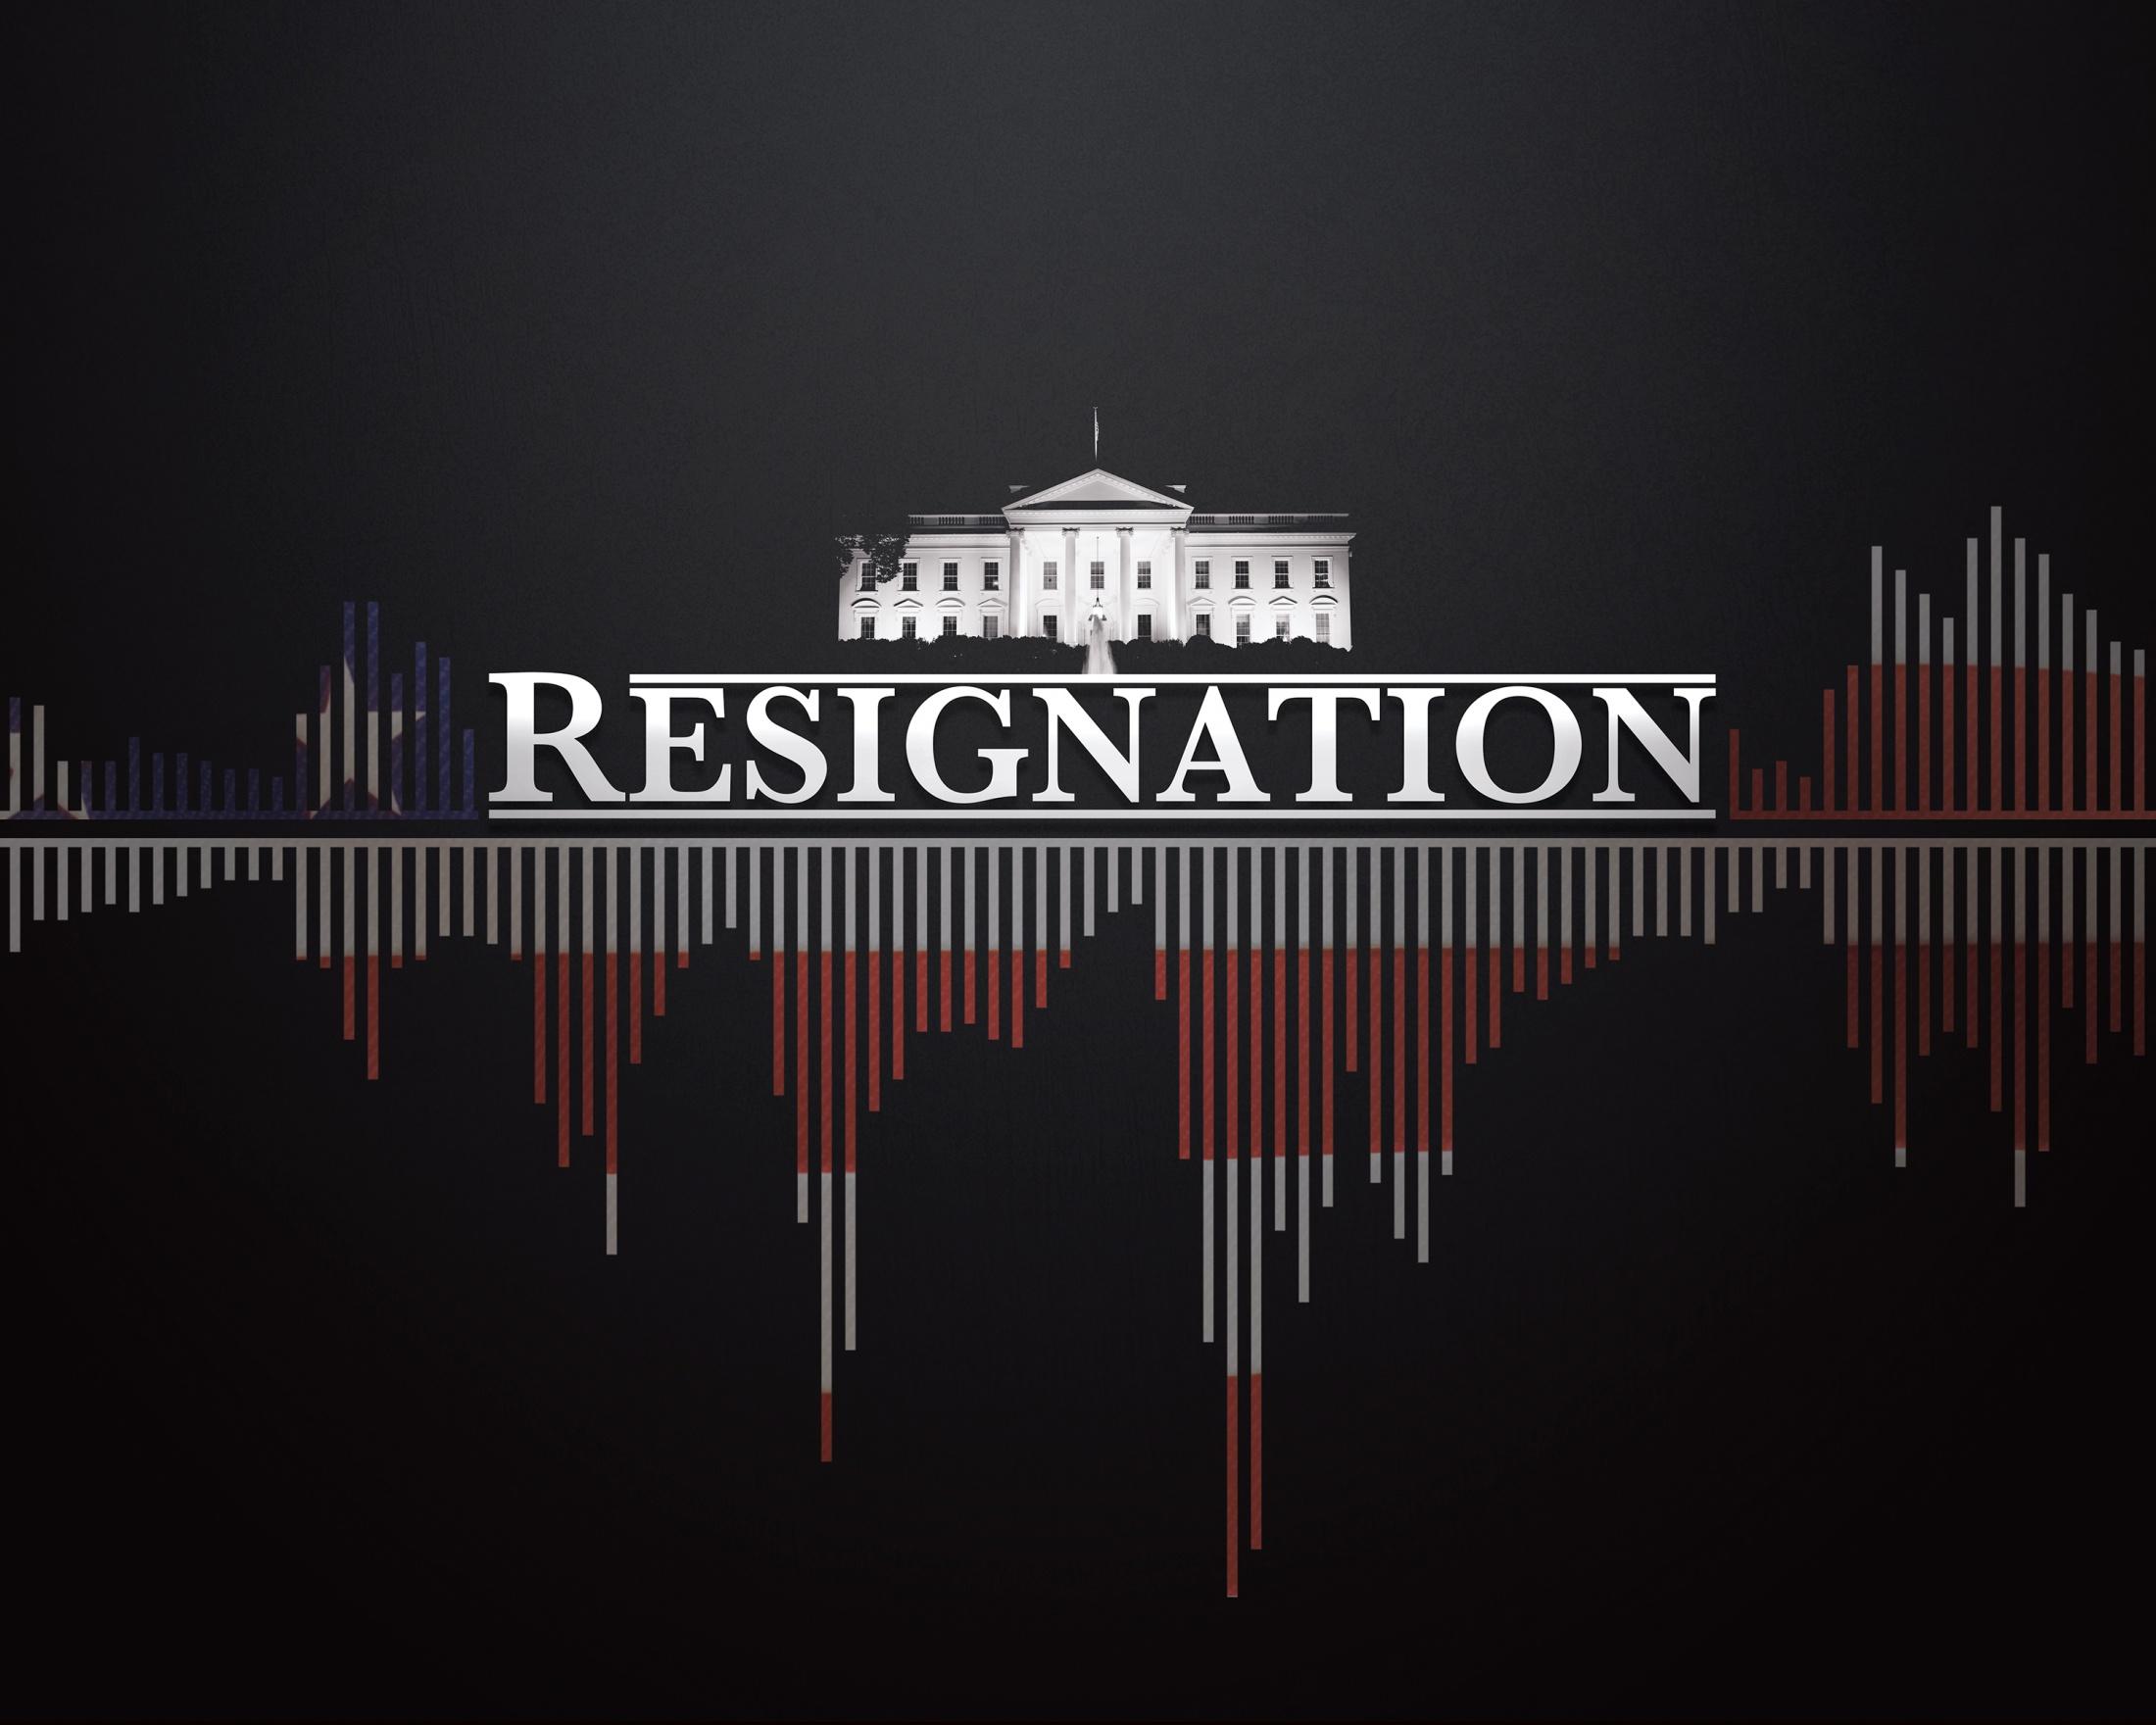 Thumbnail for Resignation